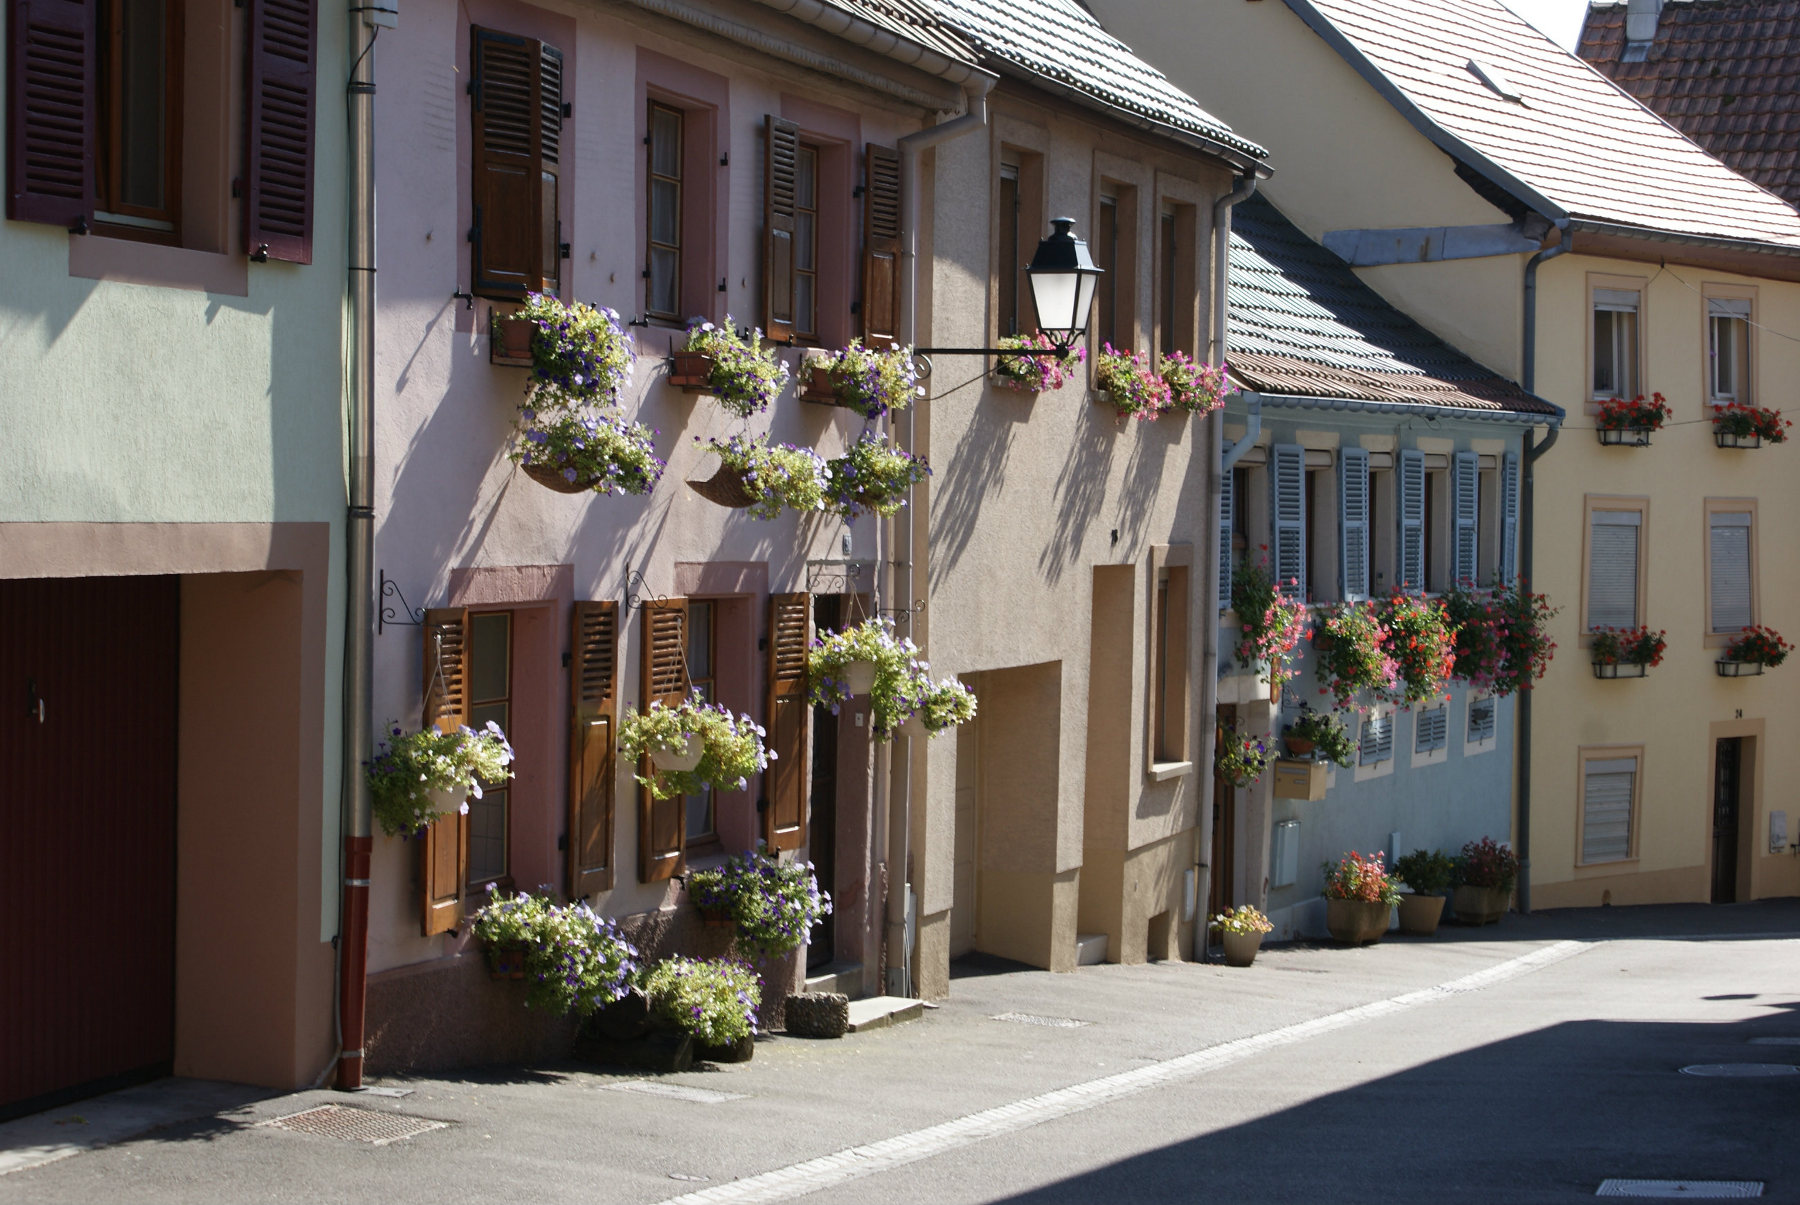 https://apps.tourisme-alsace.info/photos/thann/photos/239005259_1.JPG